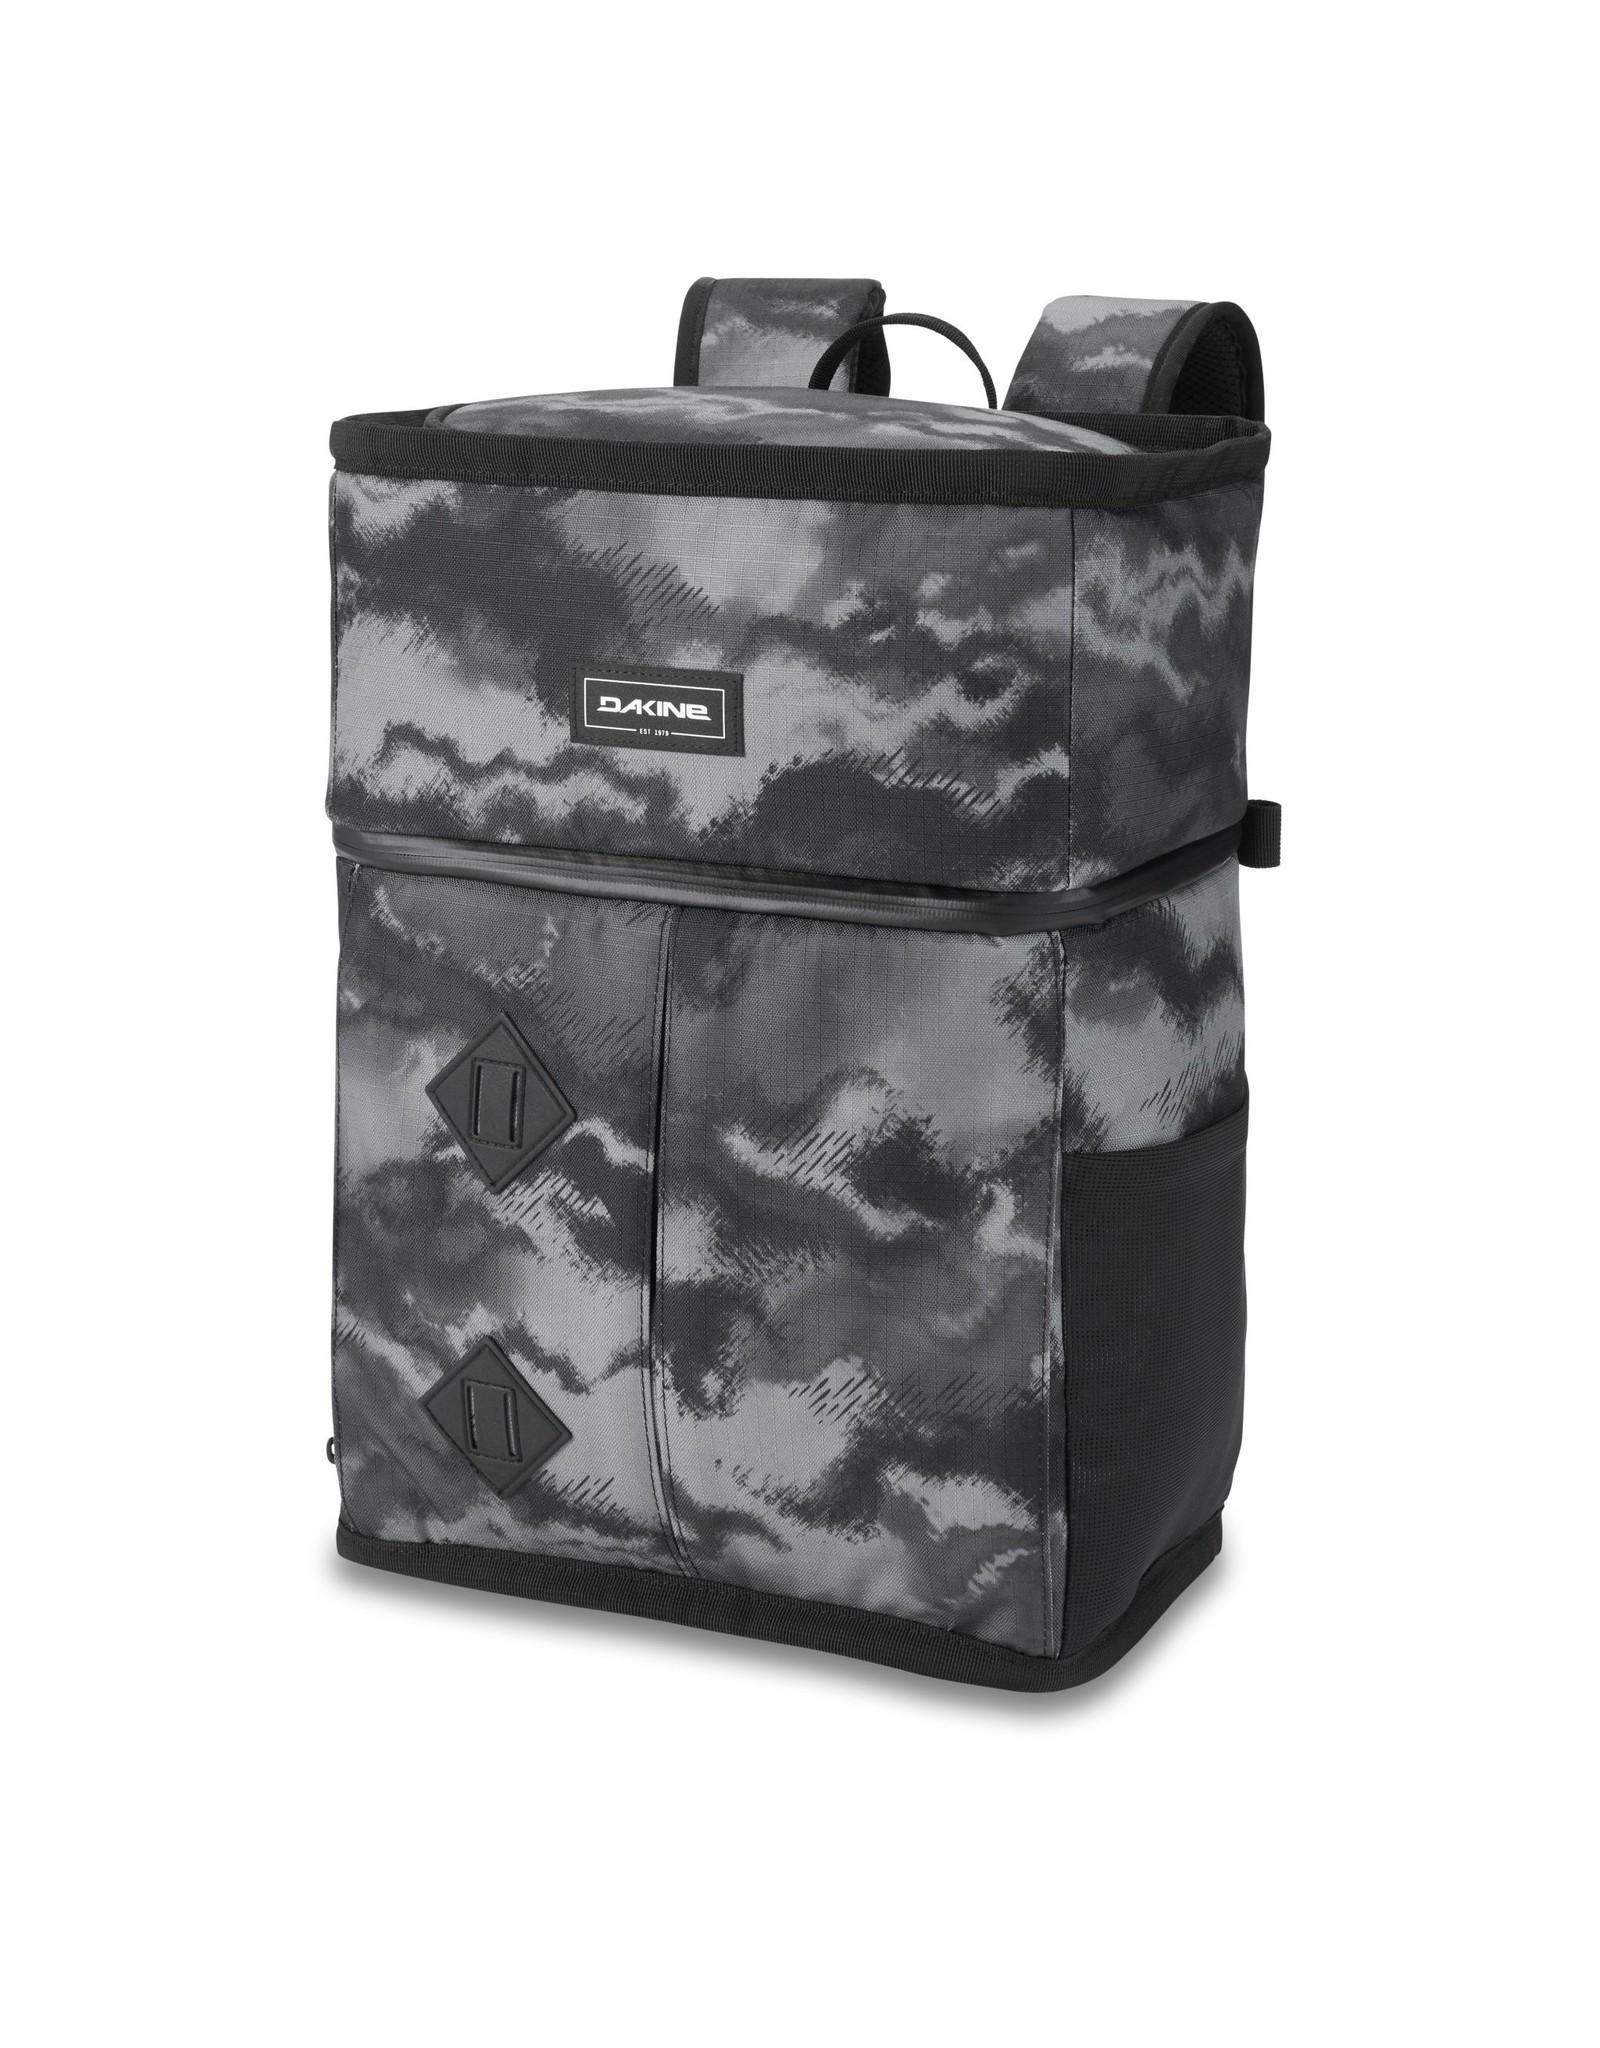 Dakine Party Pack 27L Cooler